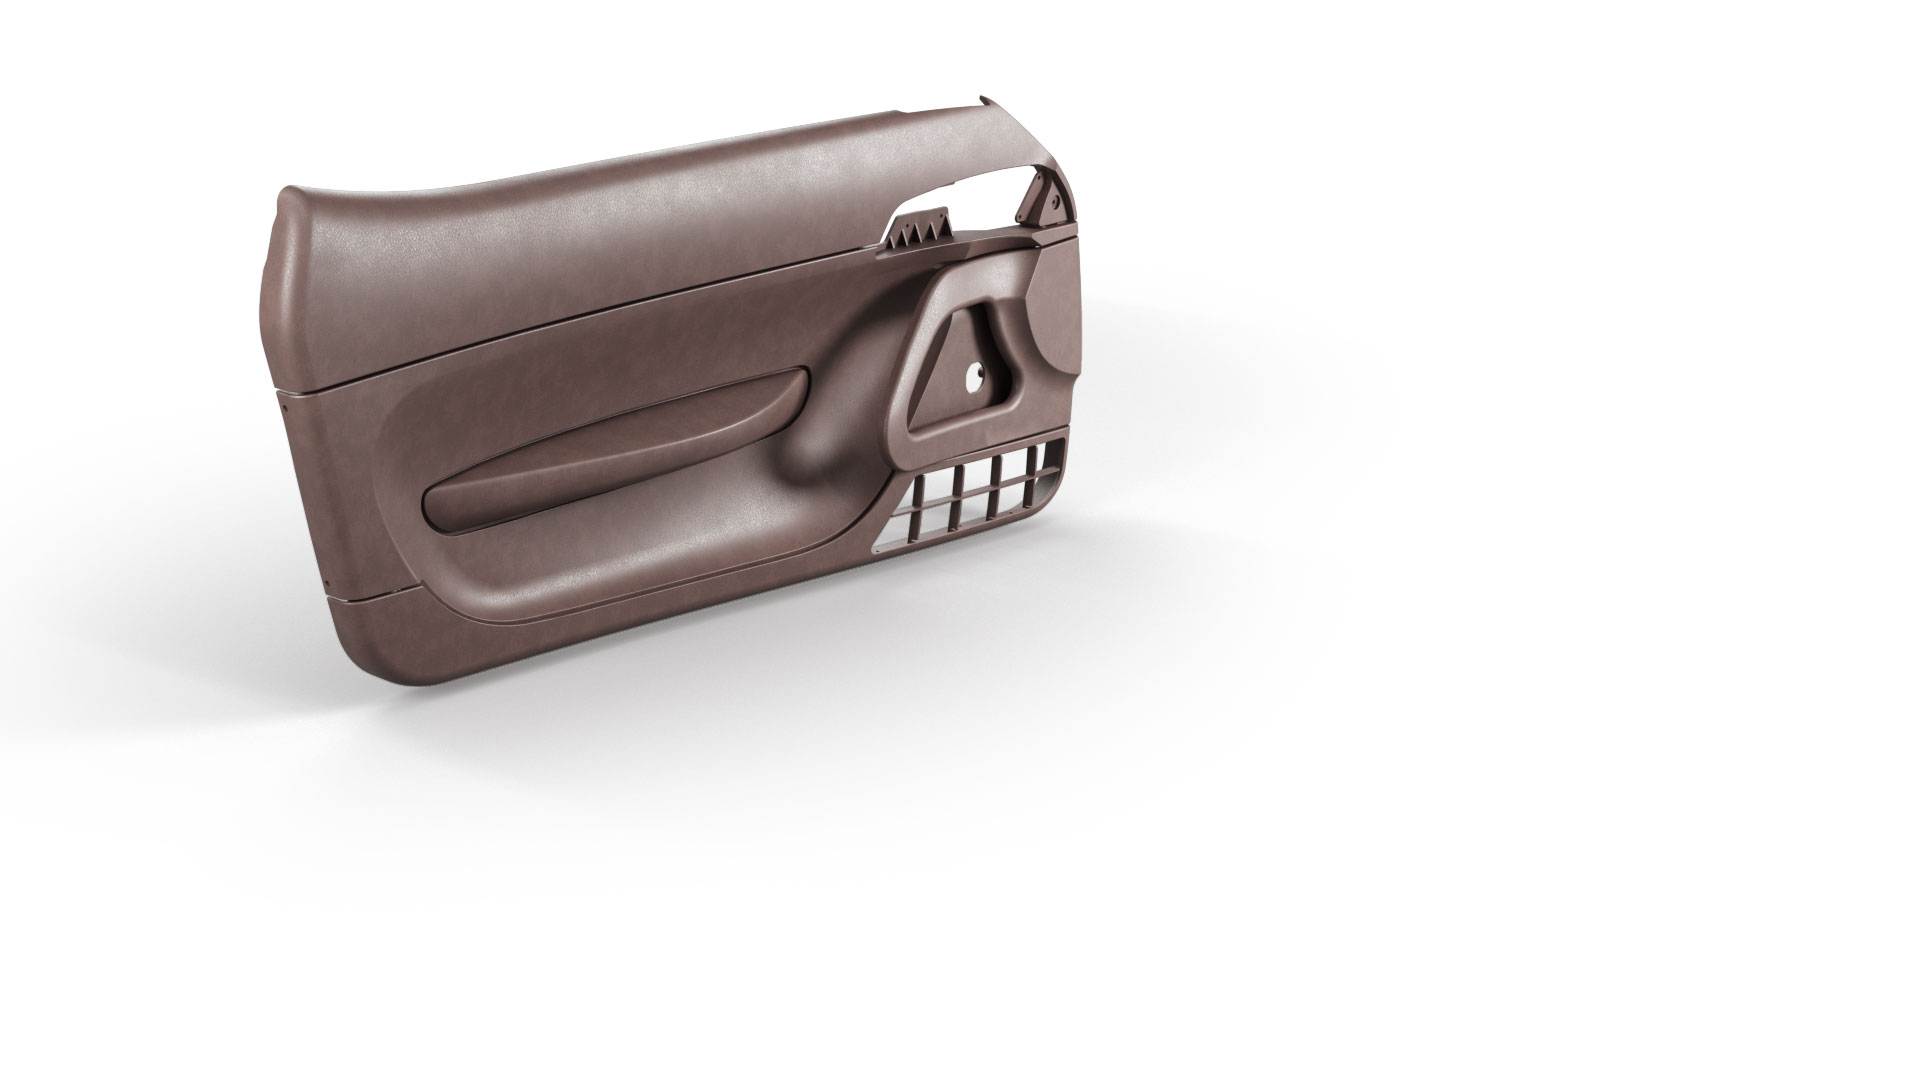 automotive-door-panels-molds-and-tools-ennegi